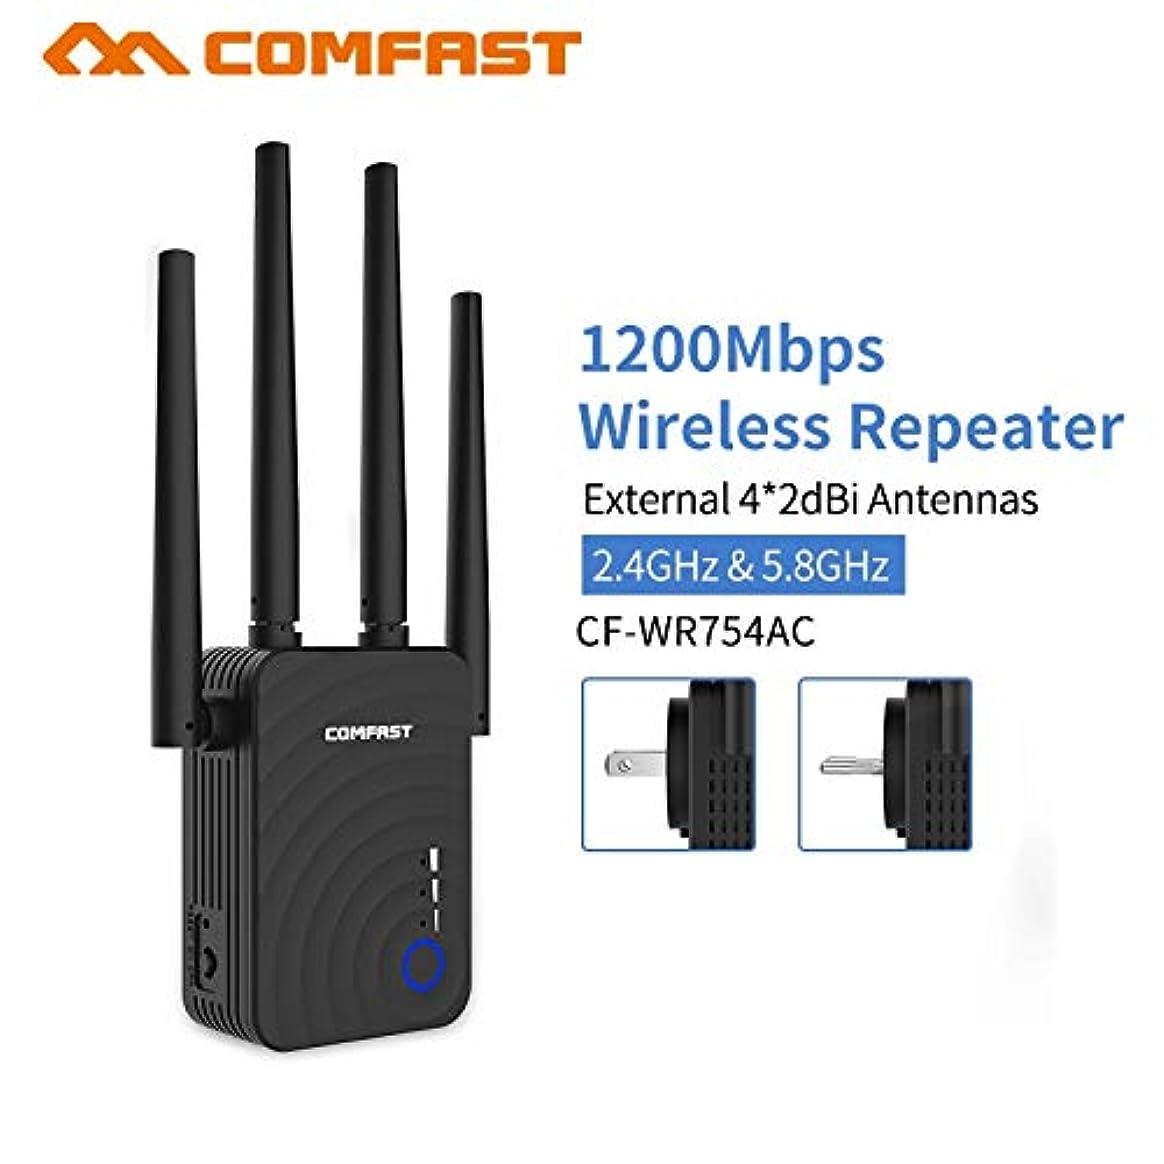 Comfast 1200MbpsワイヤレスWifiエクステンダWifiリピータ/ルーターデュアルバンド2.4&5.8Ghz 4 Wi fiアンテナ長距離信号増幅器